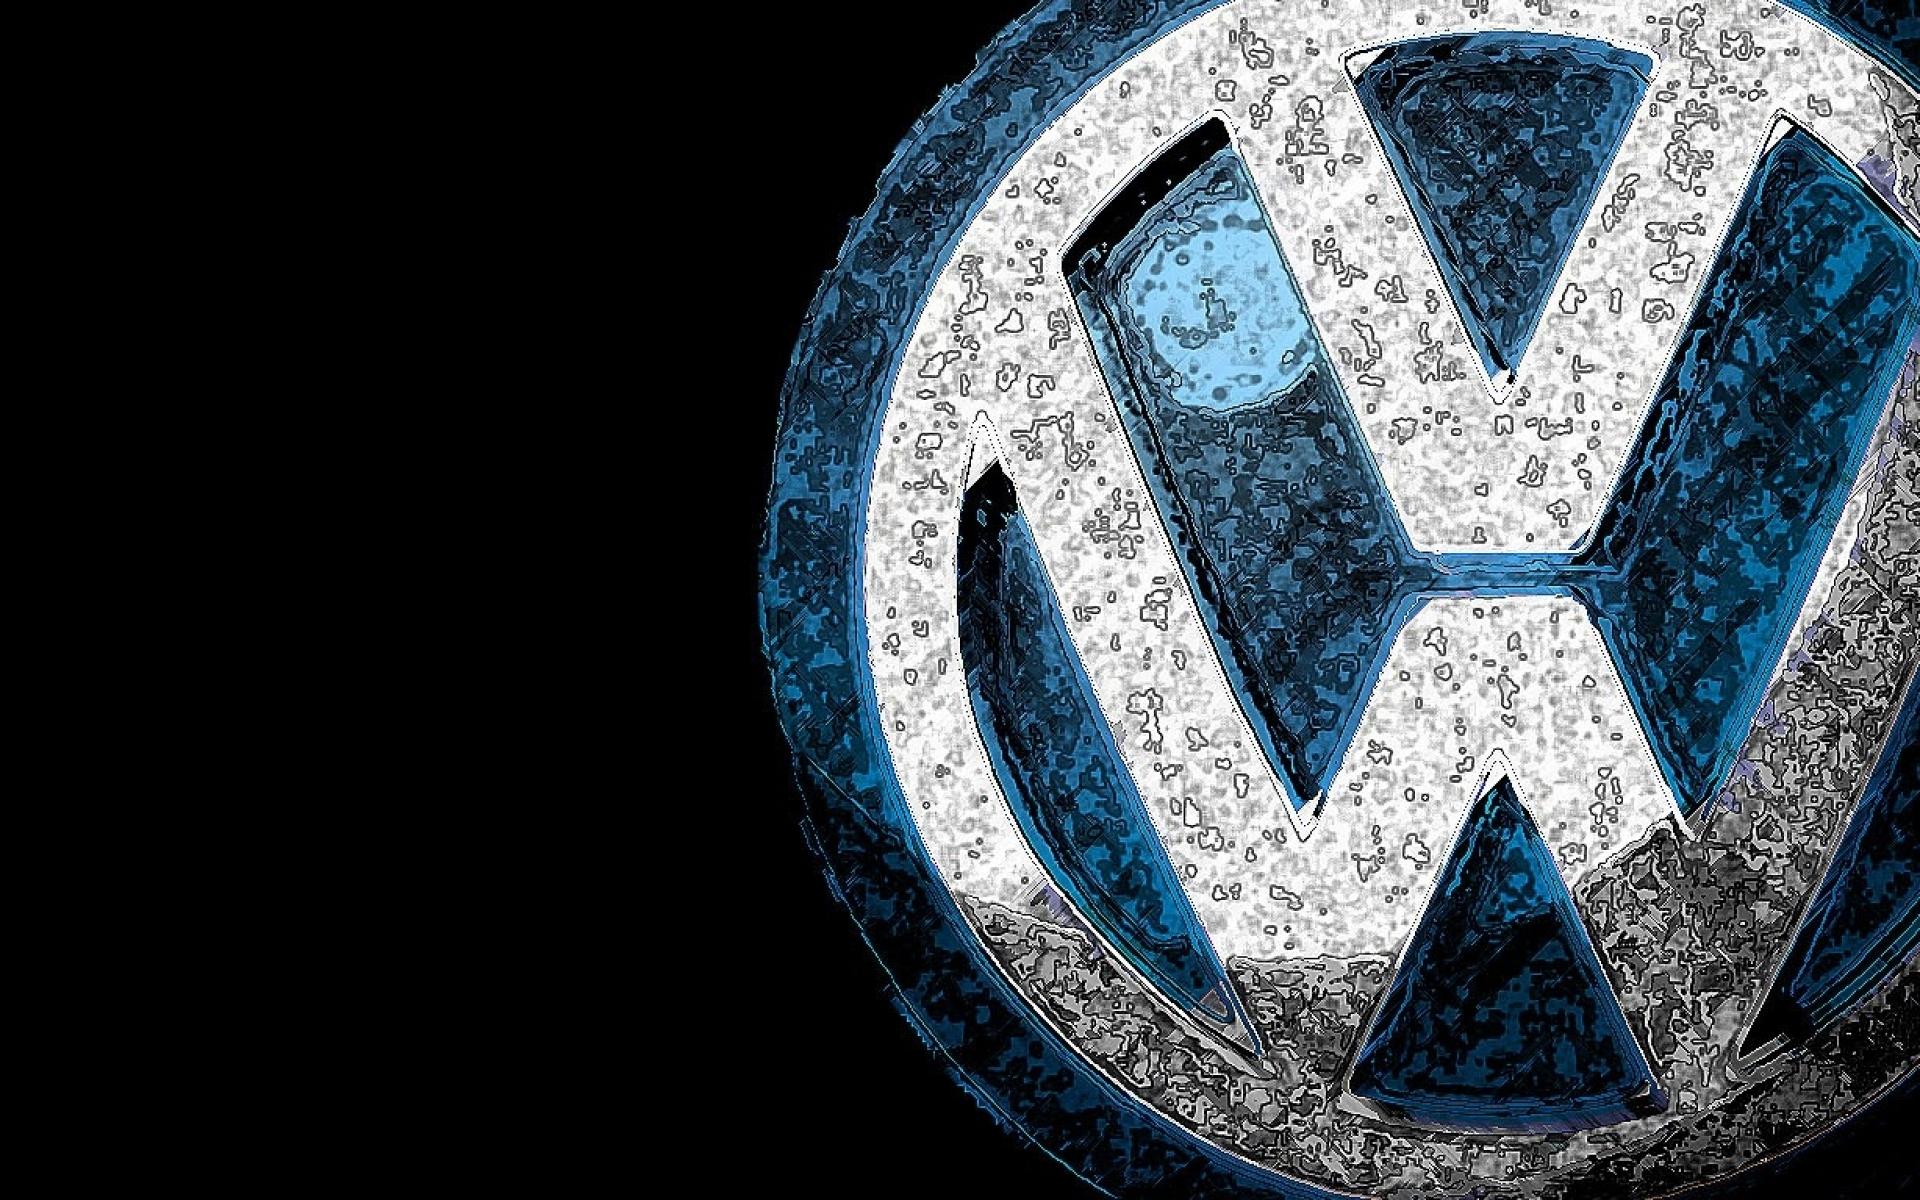 volkswagen logos 1366x768 wallpaper Wallpaper 1920x1200 wwwwall321 1920x1200